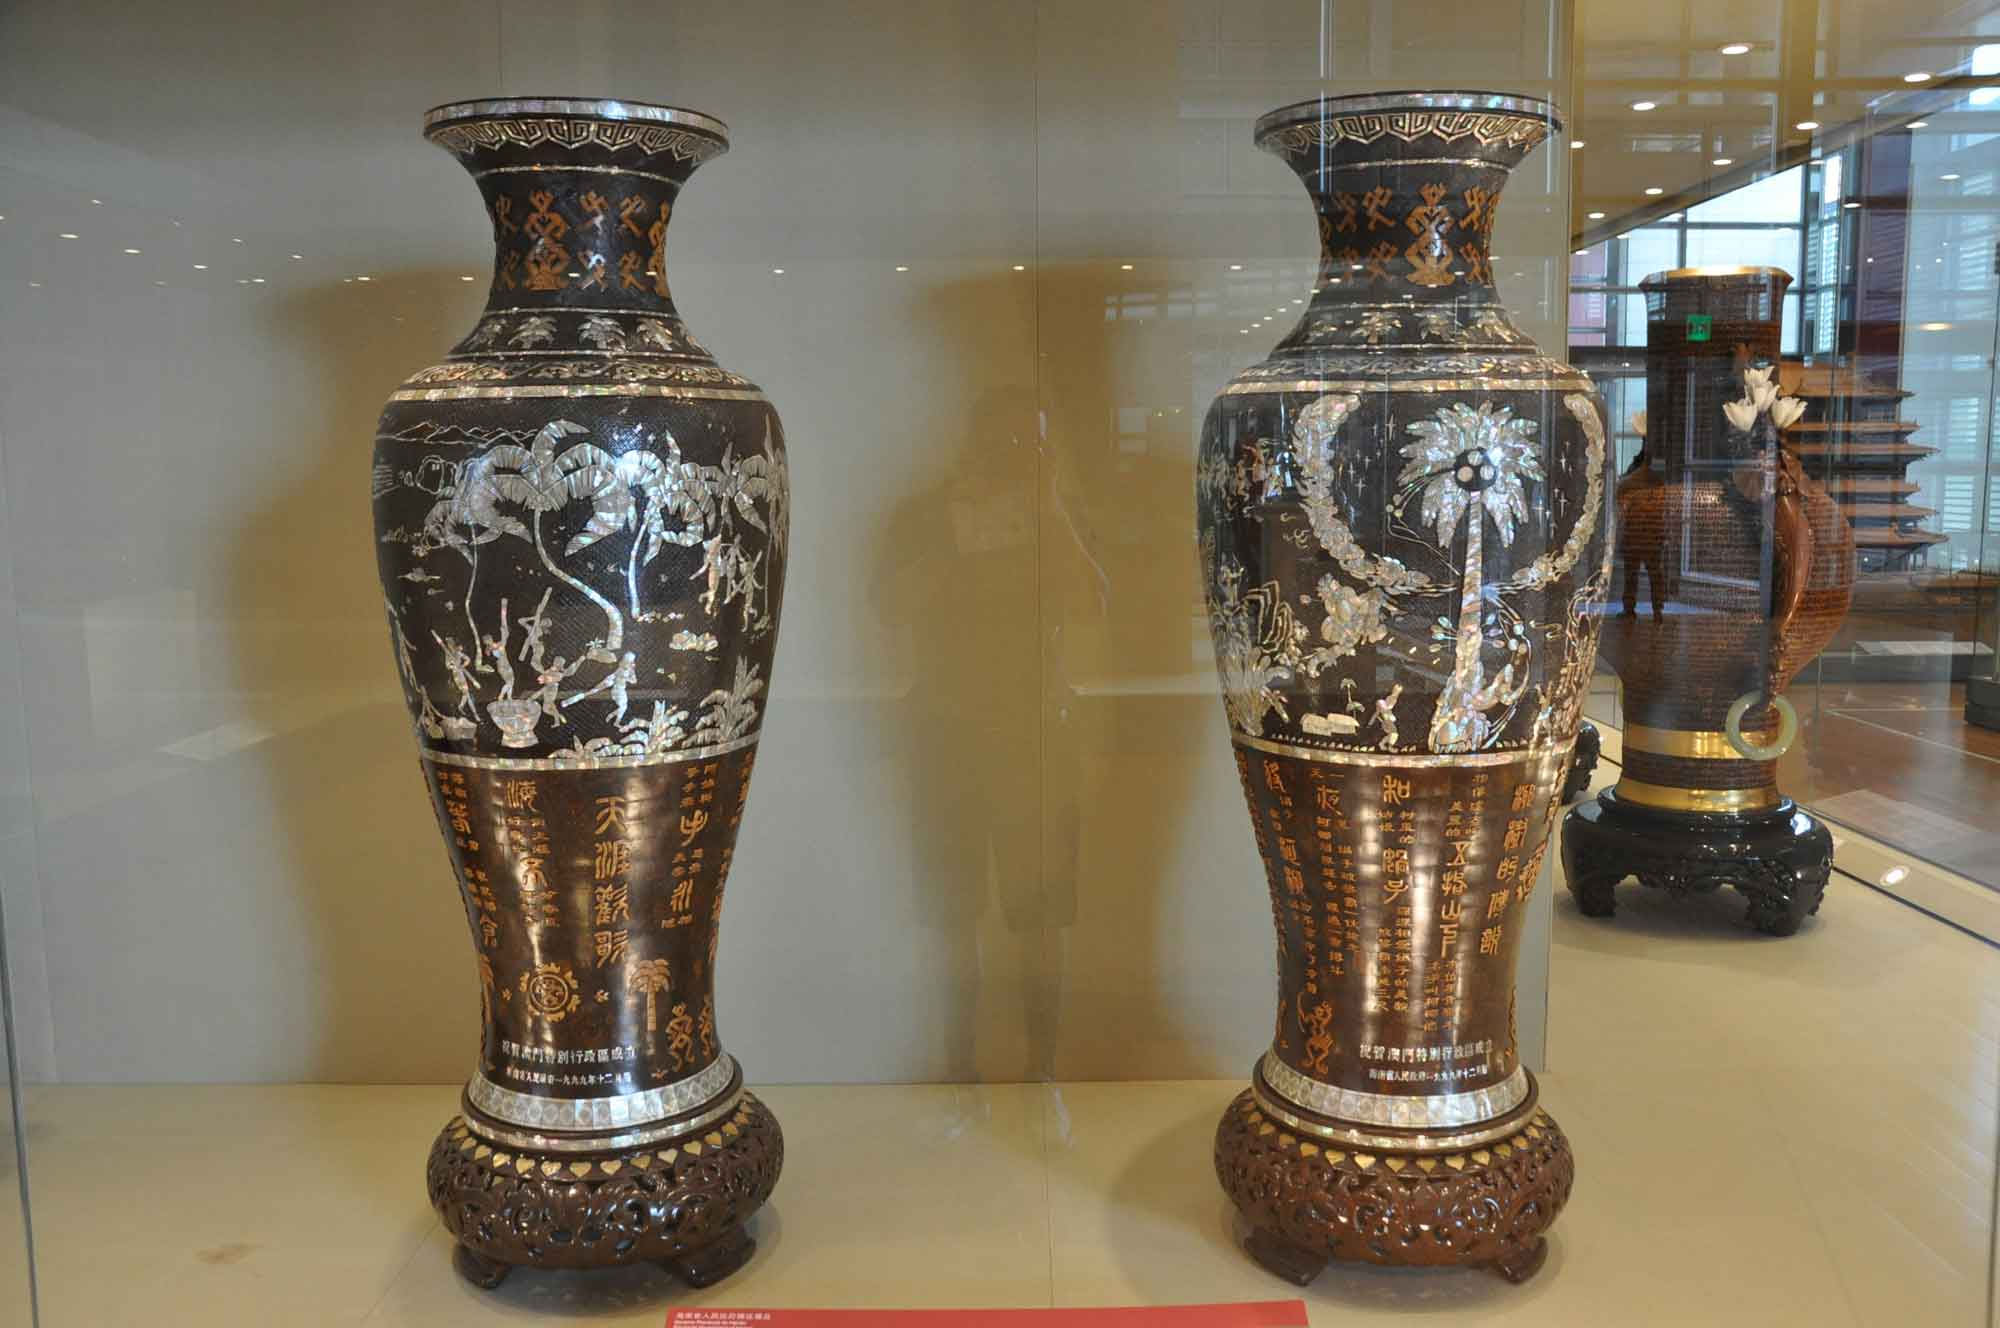 Handover Gifts Museum Macau Hainan island coconut vases